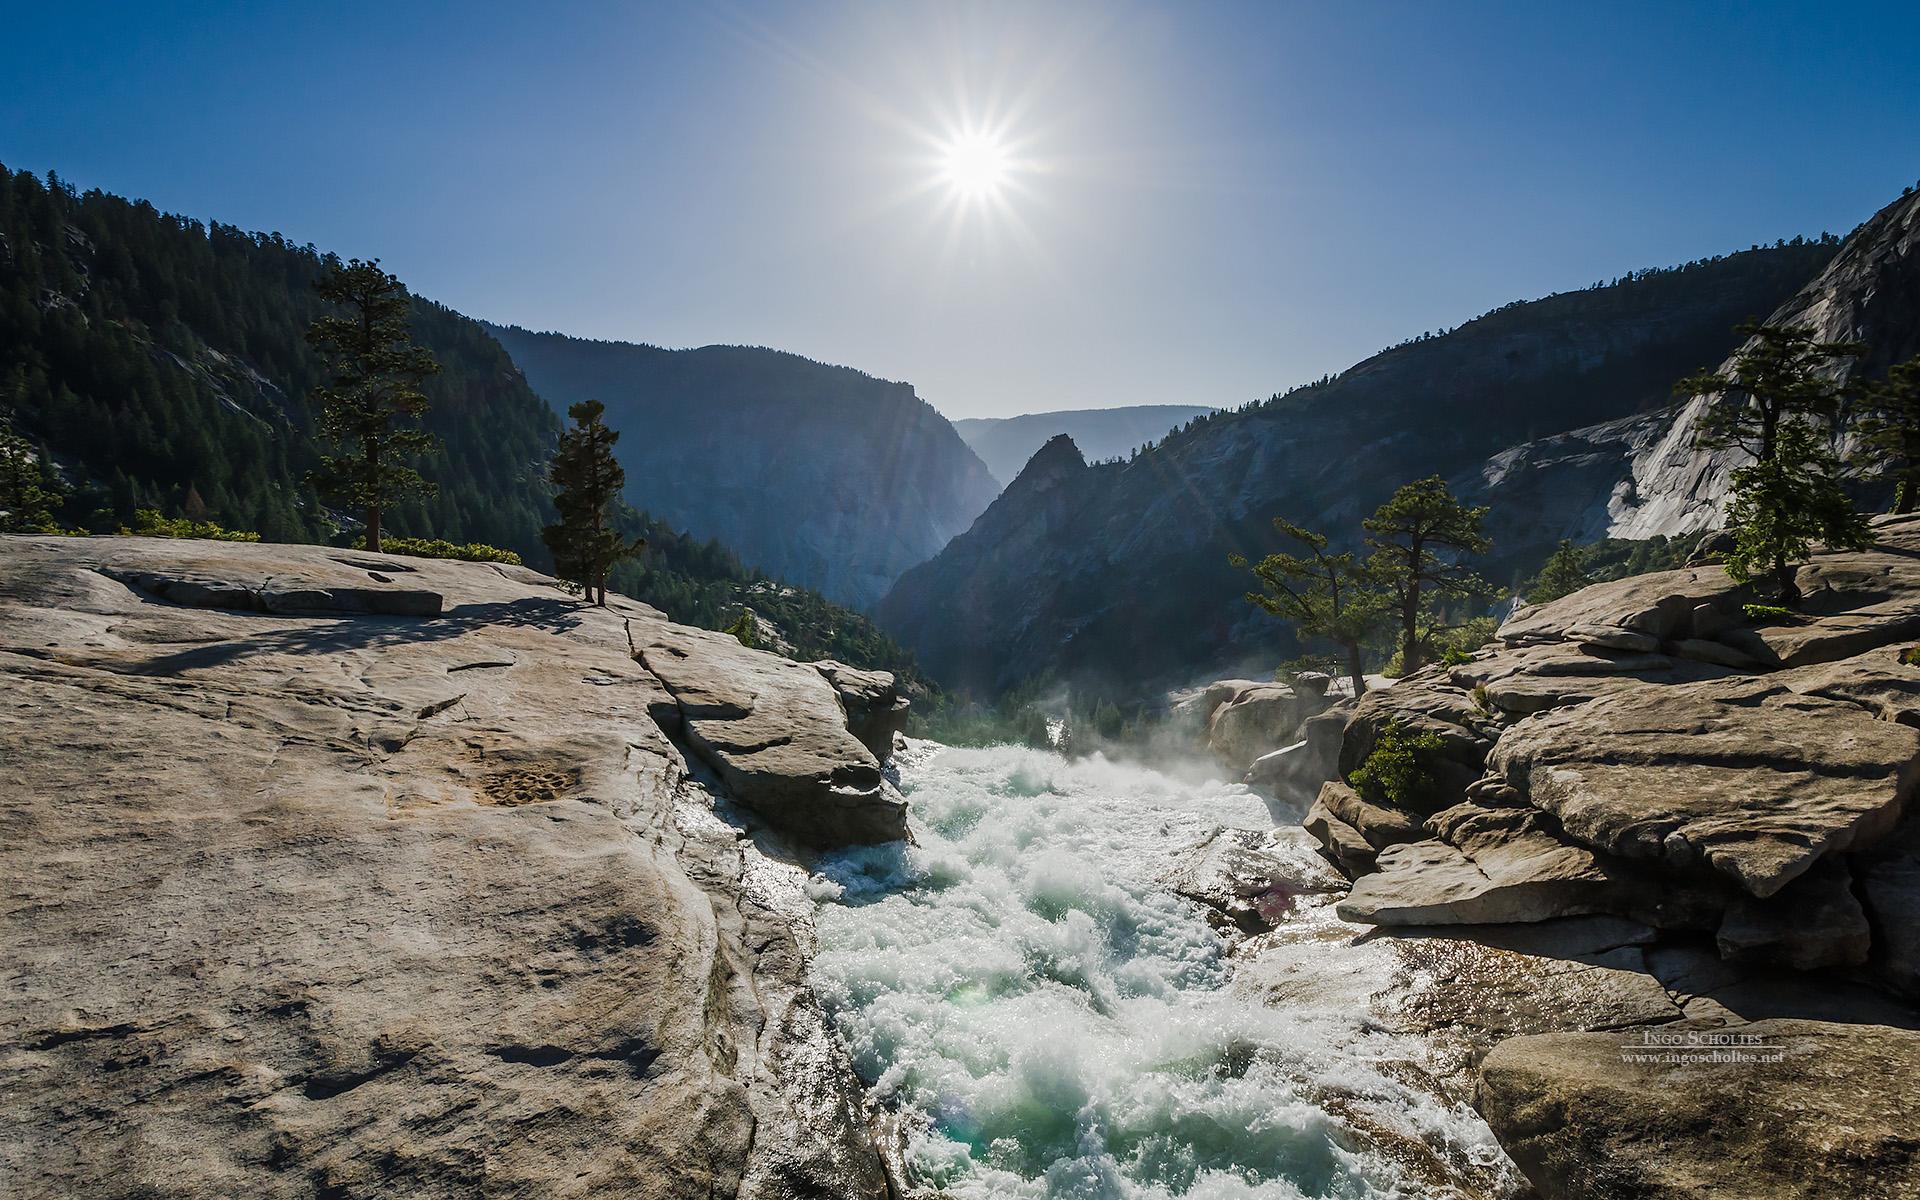 Nevada Fall Yosemite National Park Wallpapers HD Wallpapers 1920x1200